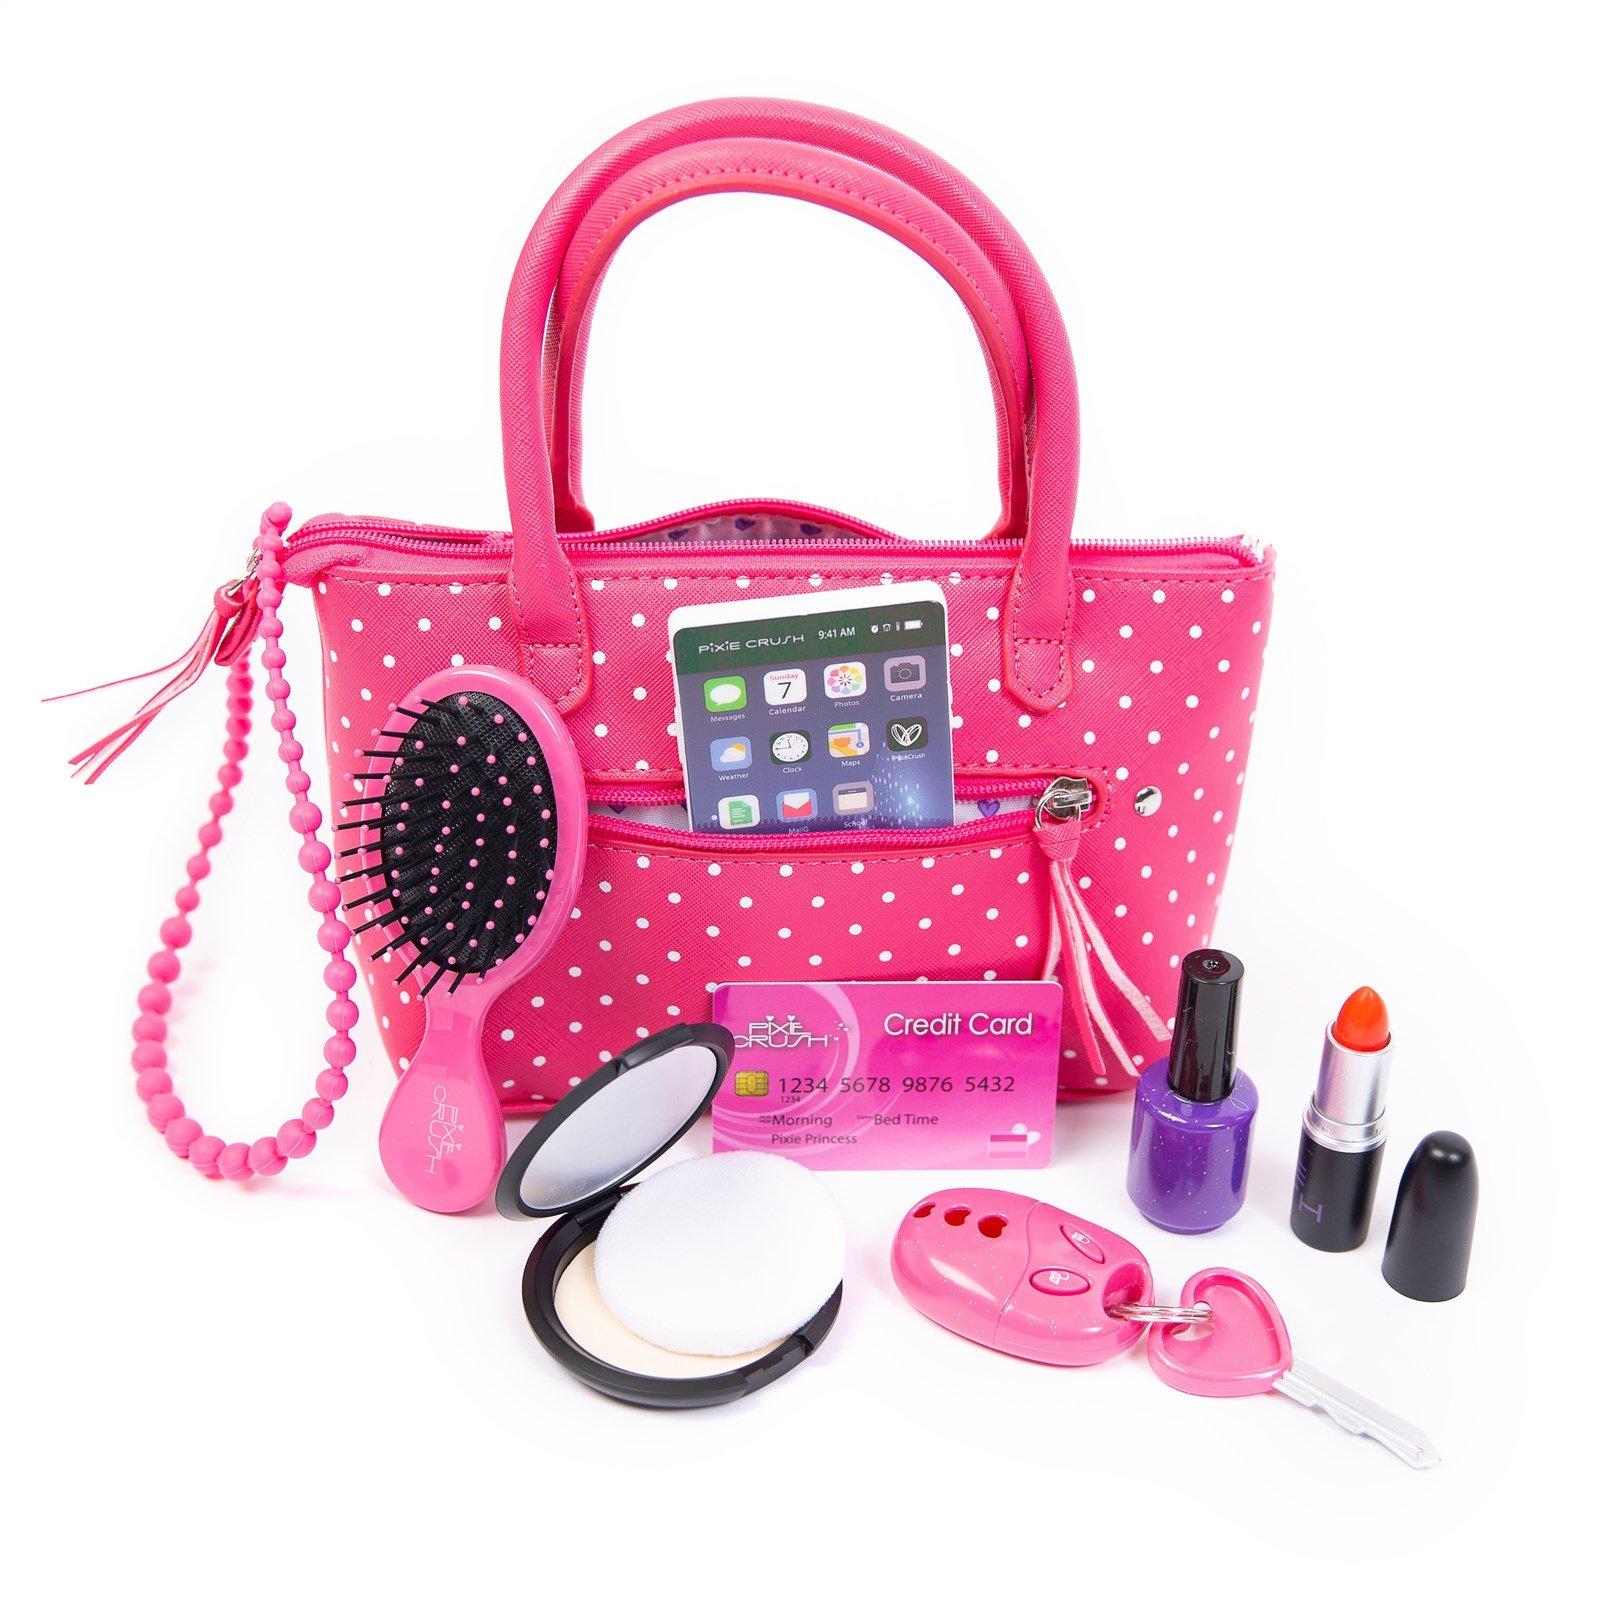 Purses w/Pretend Makeup & Accessories